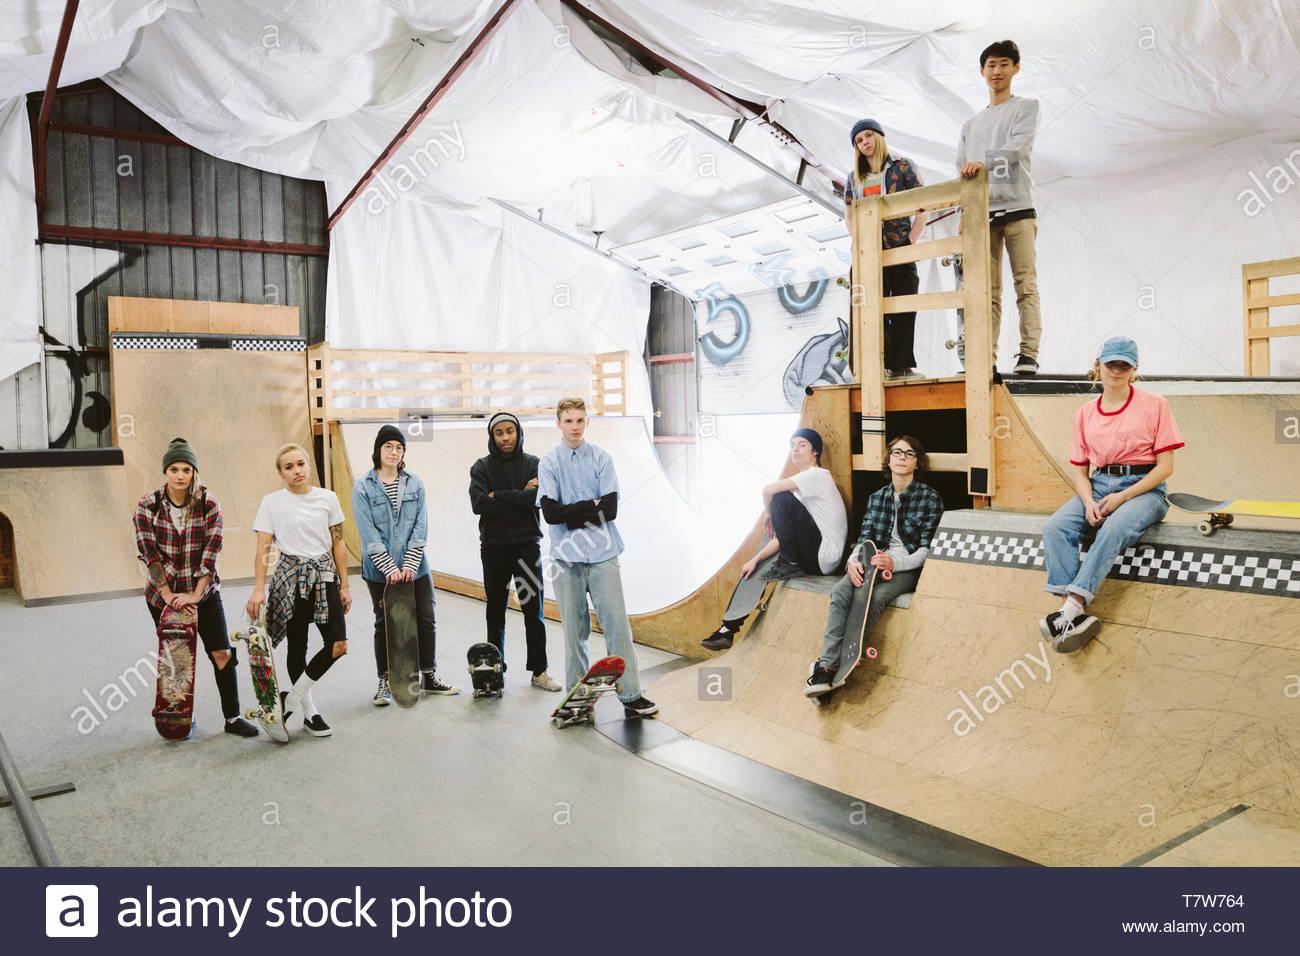 Portrait confident young friends skateboarding at indoor skate park - Stock Image